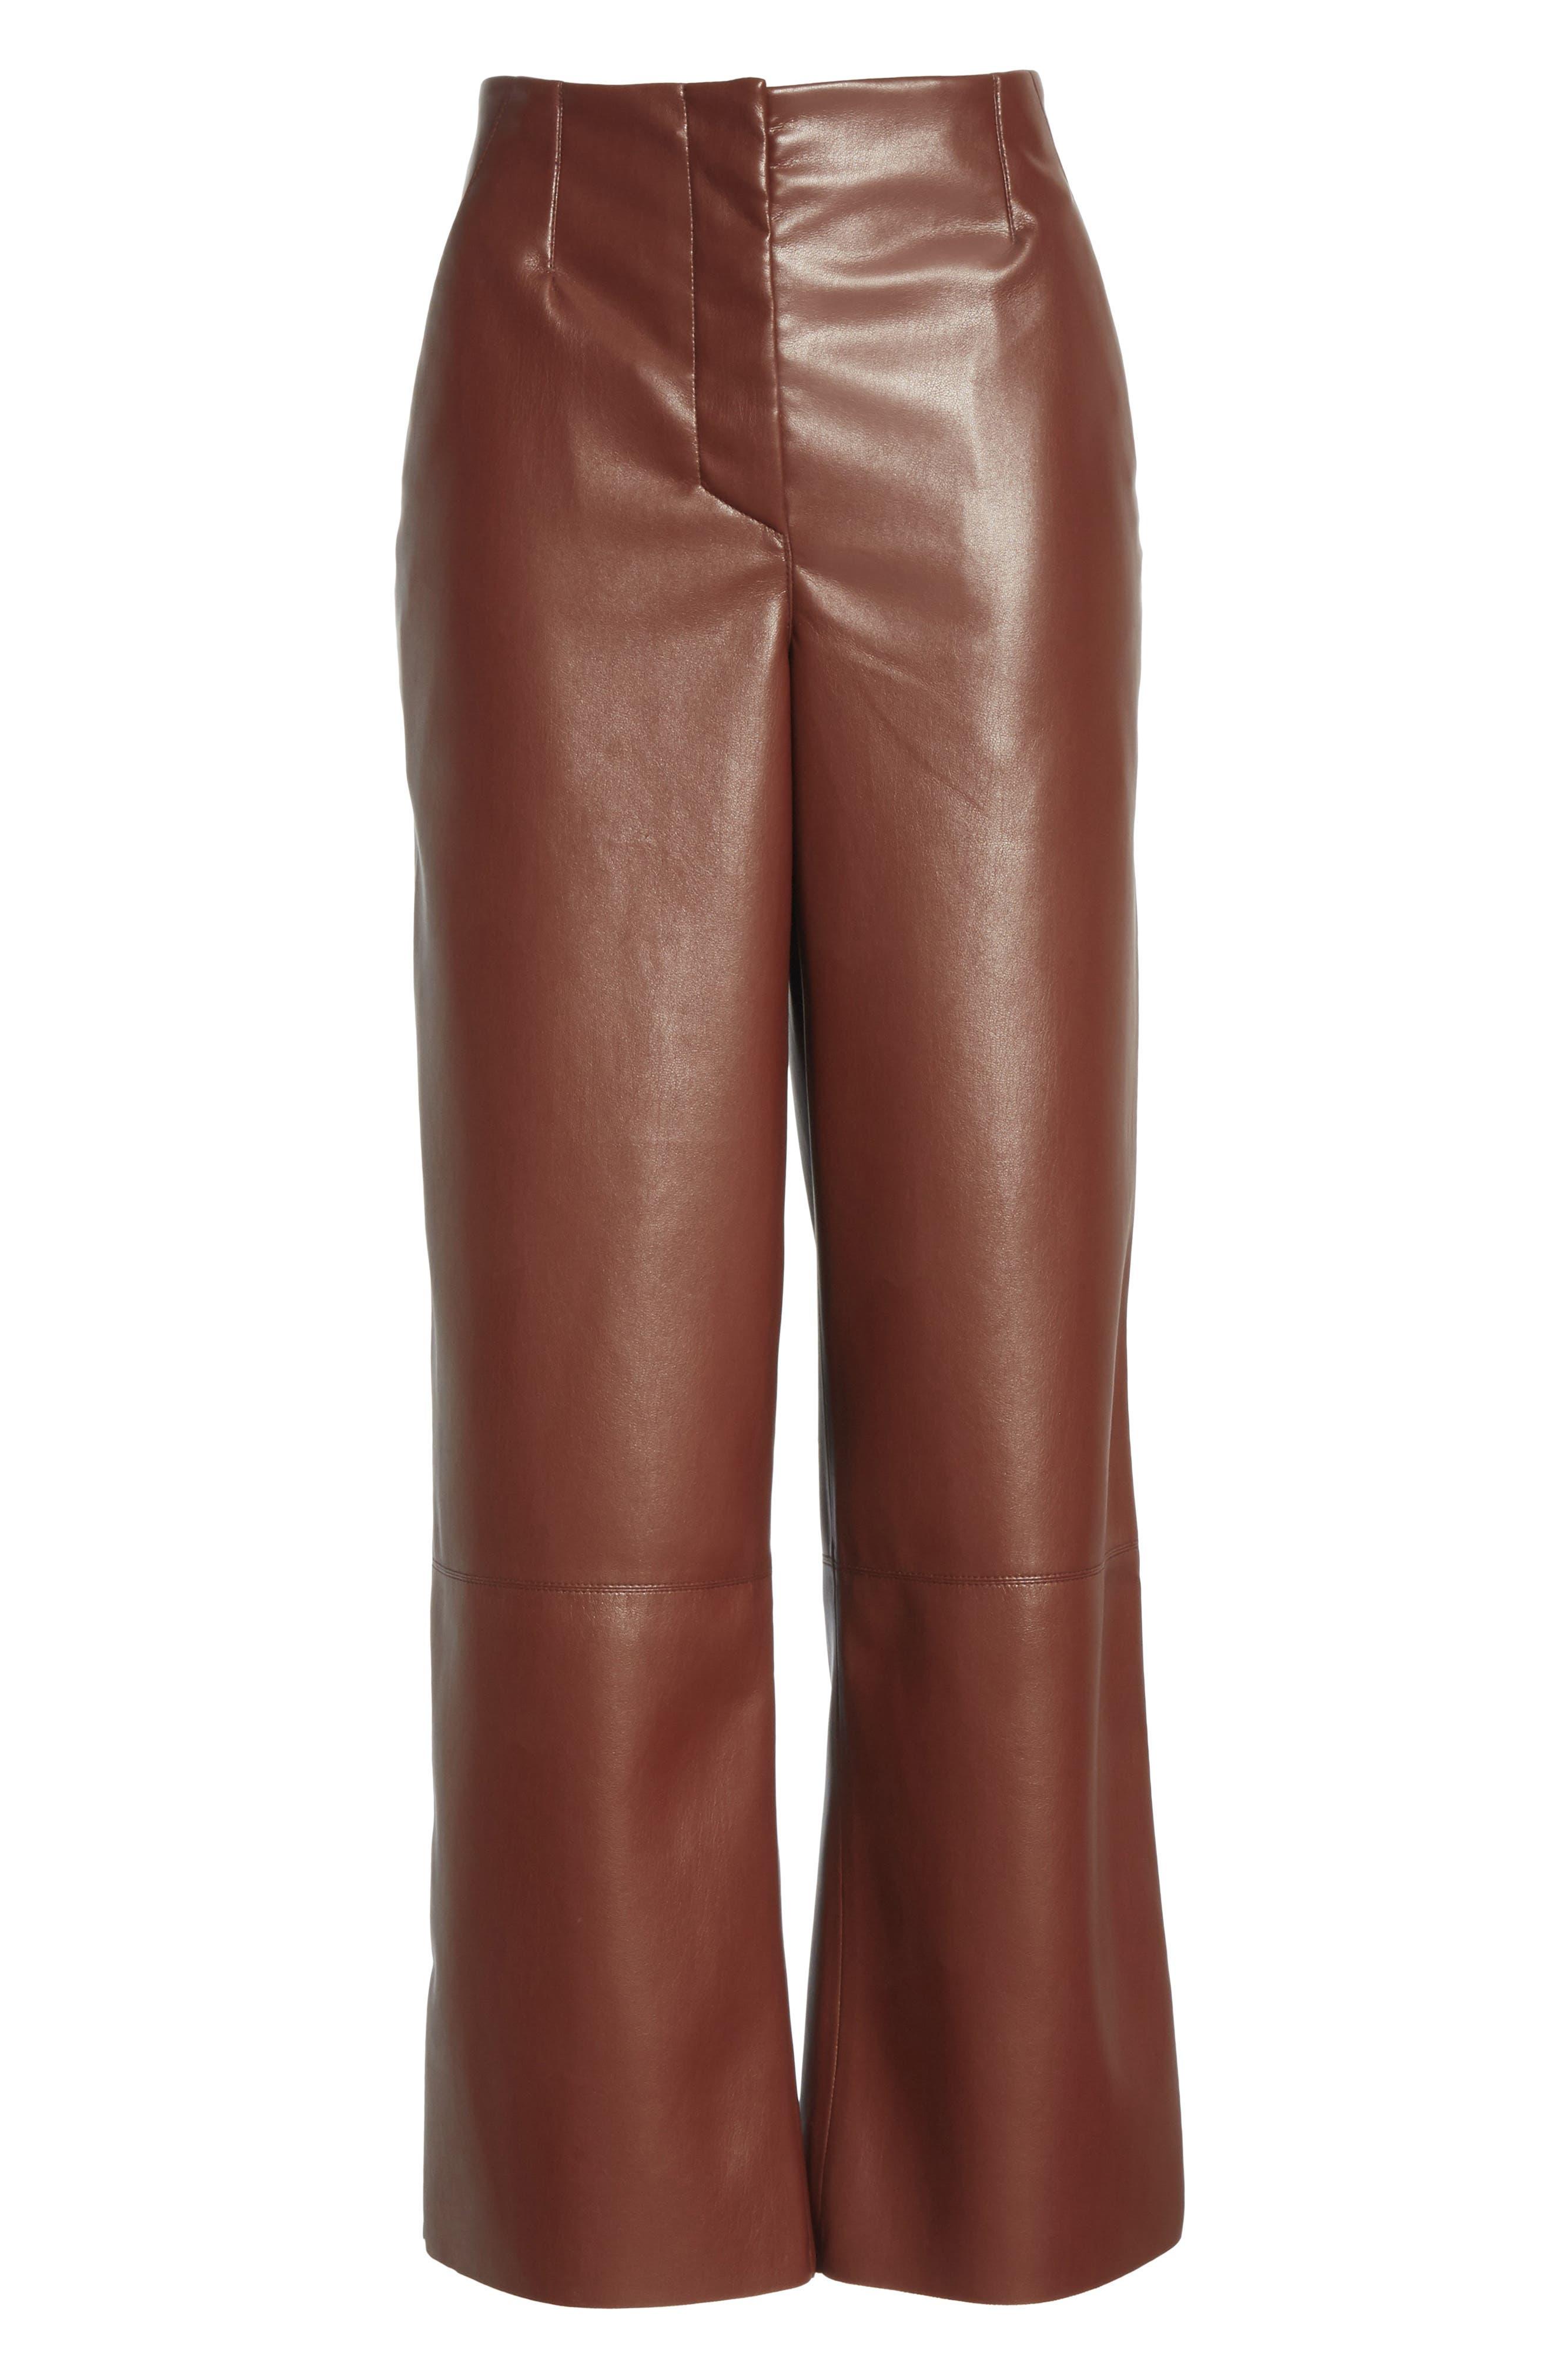 Africa Faux Leather Wide Leg Crop Pants,                             Alternate thumbnail 6, color,                             PLUM CHUTNEY